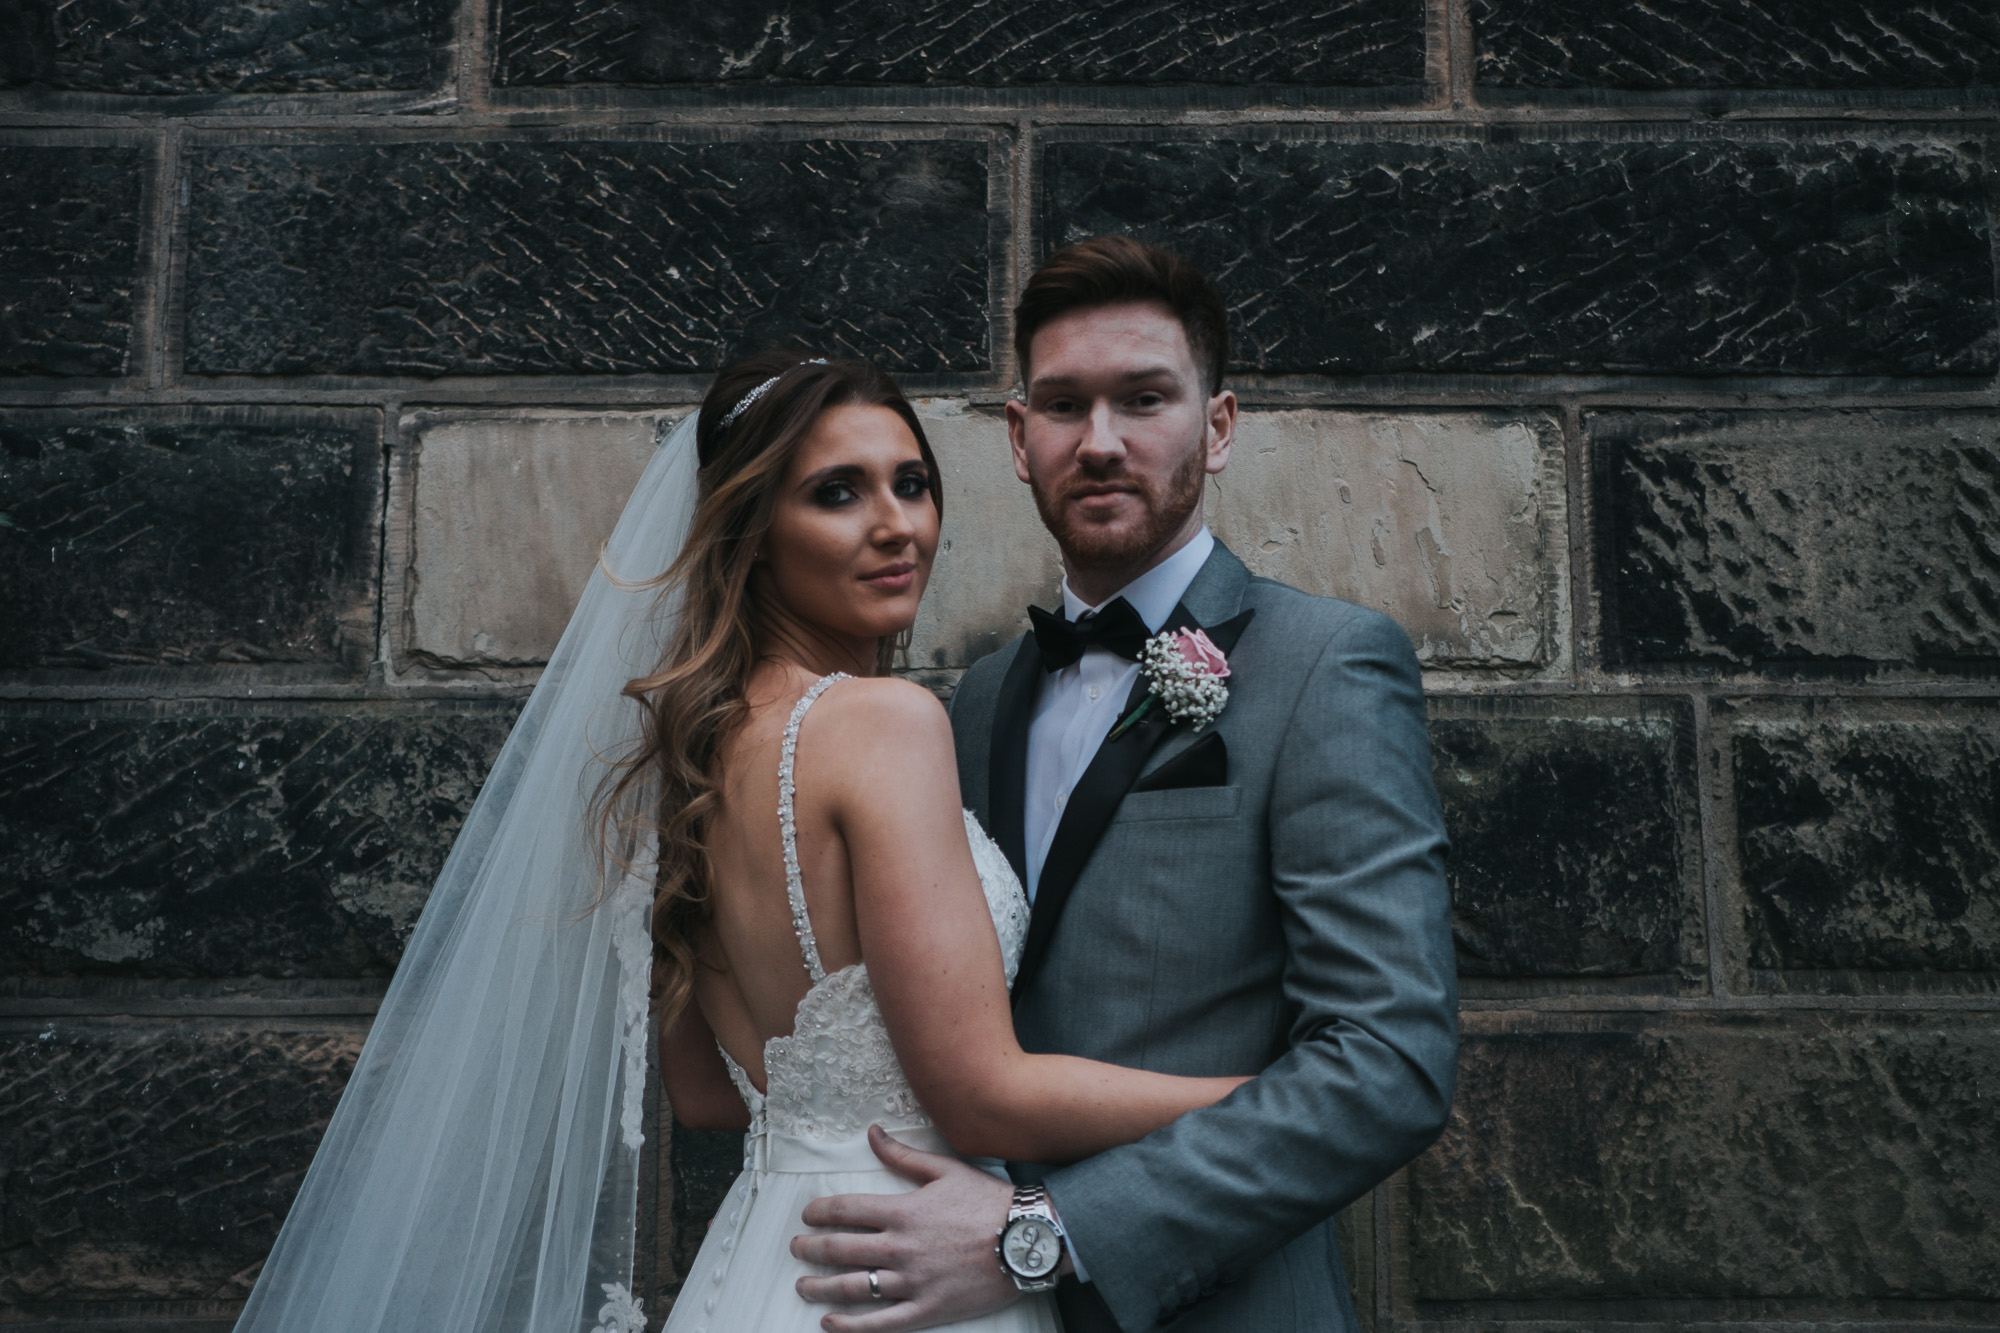 West Tower Exclusive Wedding Venue wedding photography merseyside and lancashire wedding photographer (43 of 60).jpg